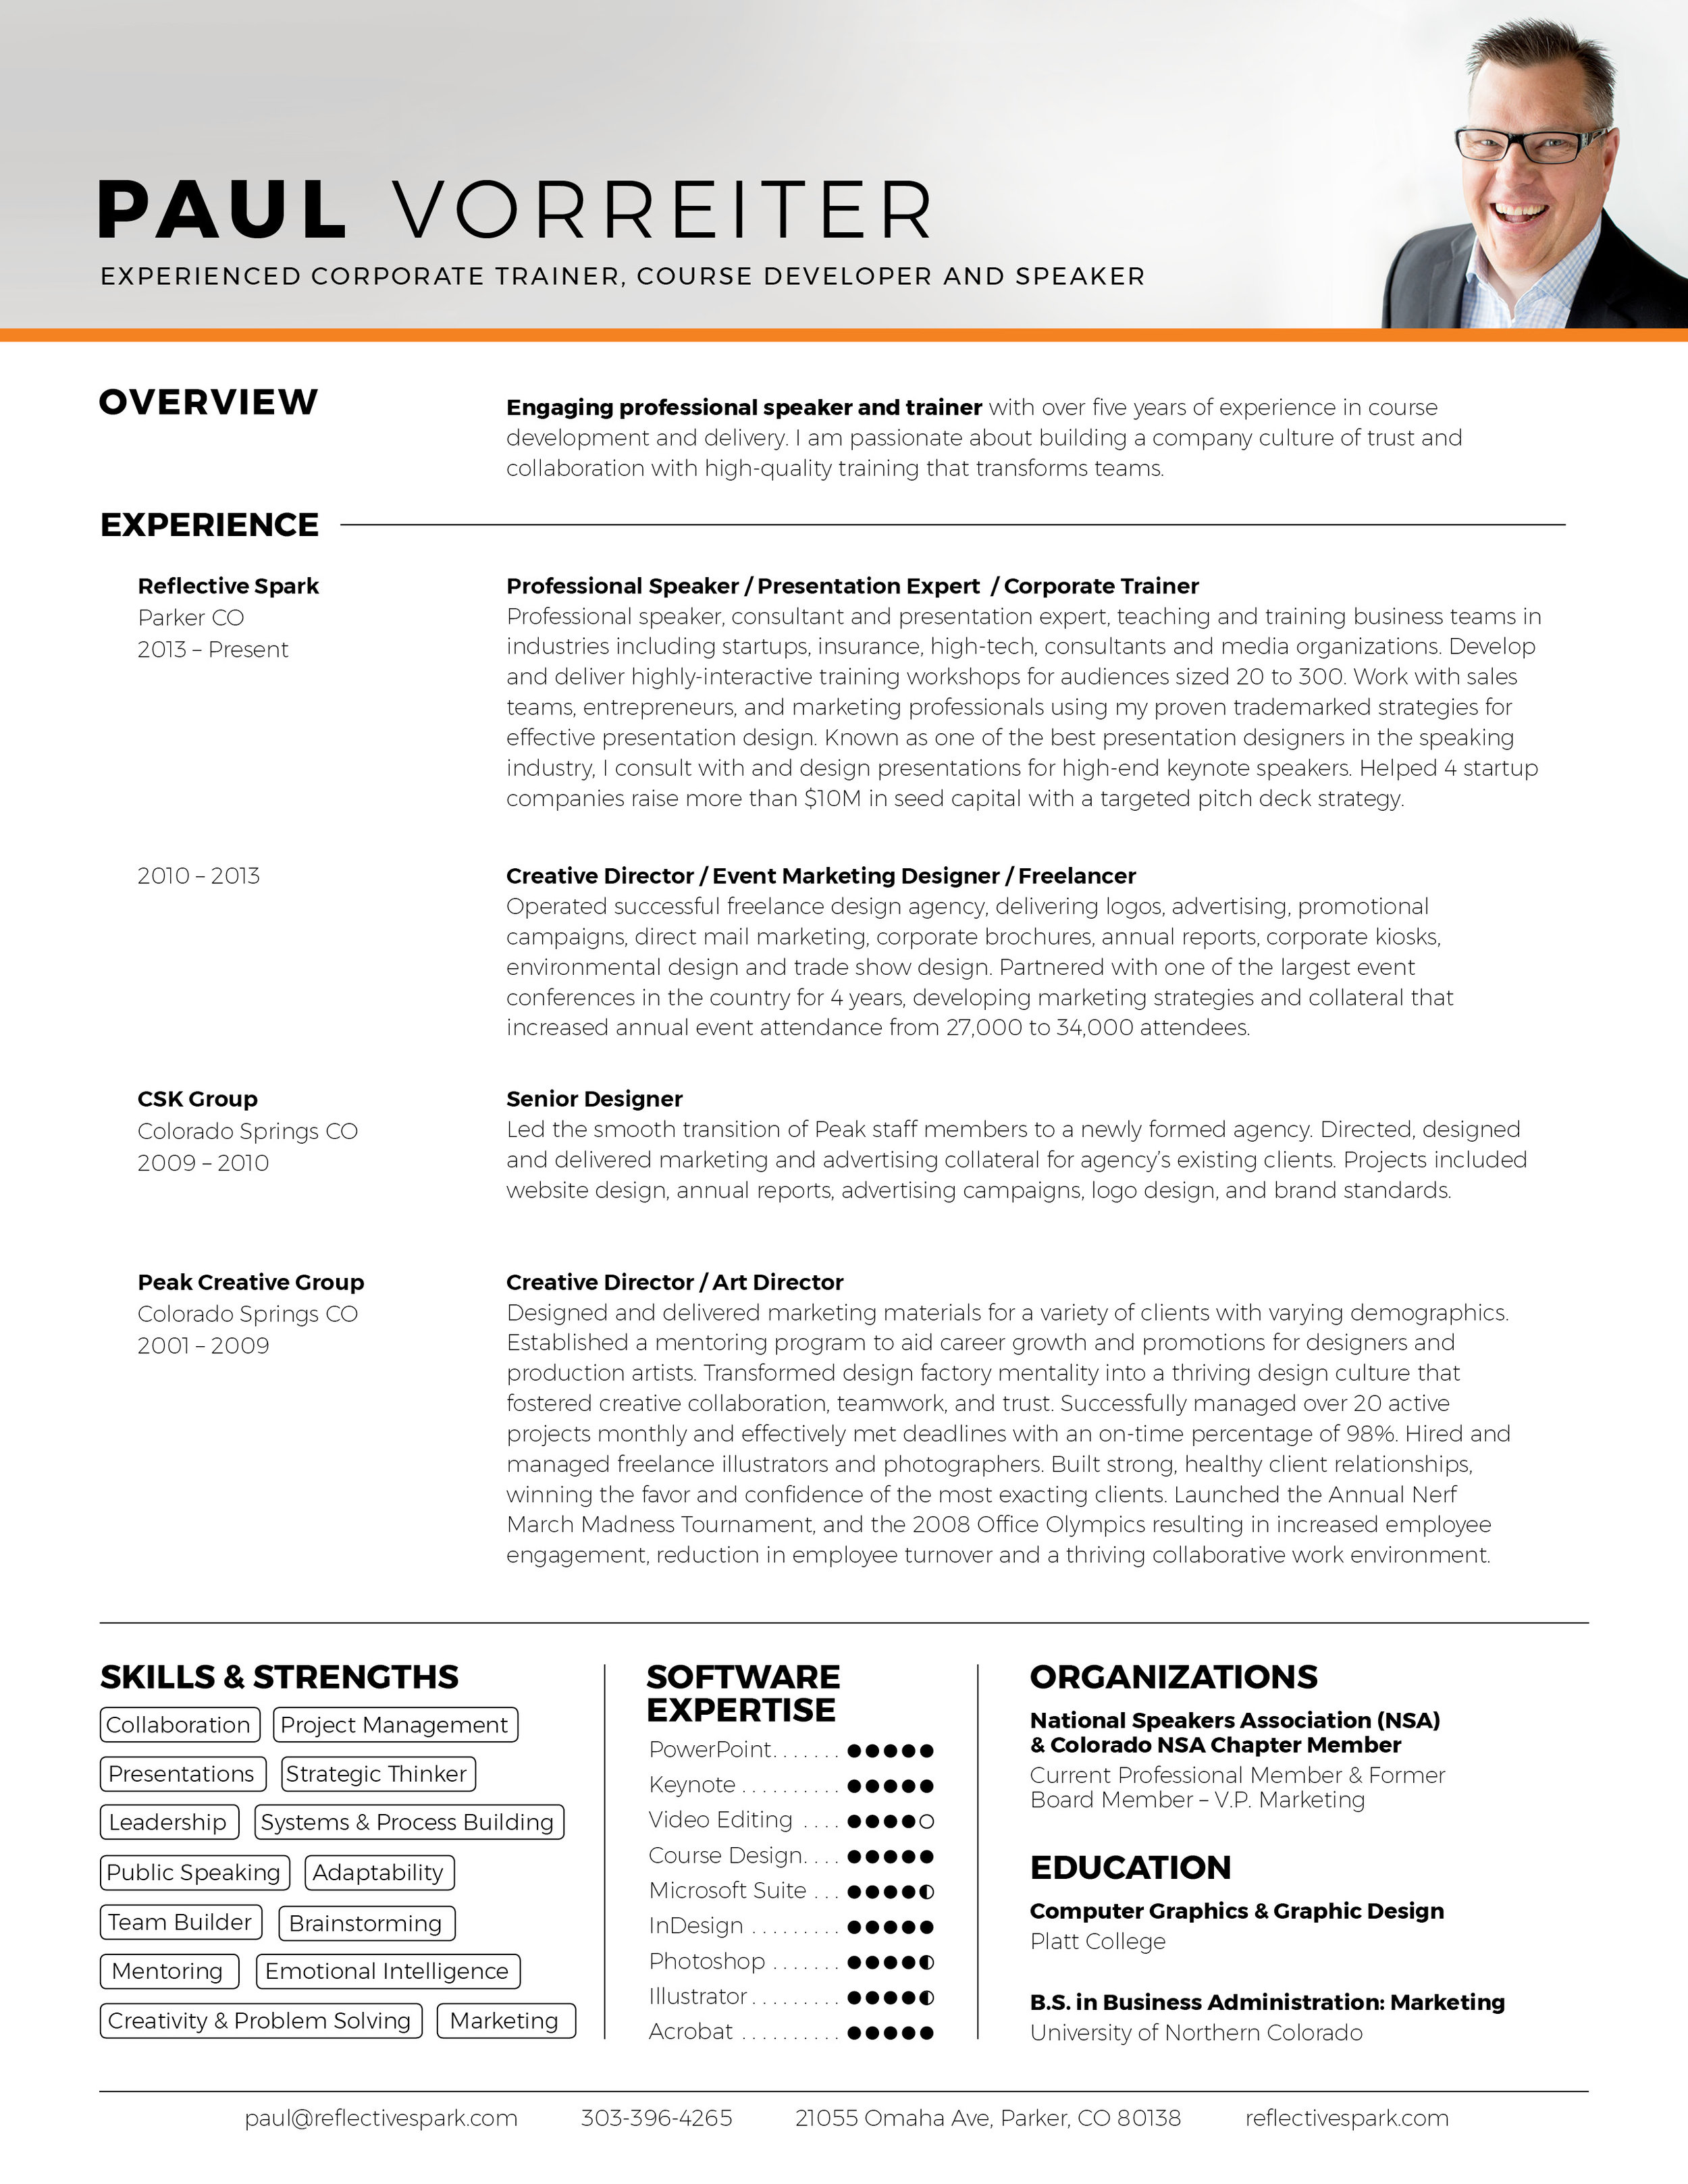 PaulVorreiter-Resume-Trainer.jpg